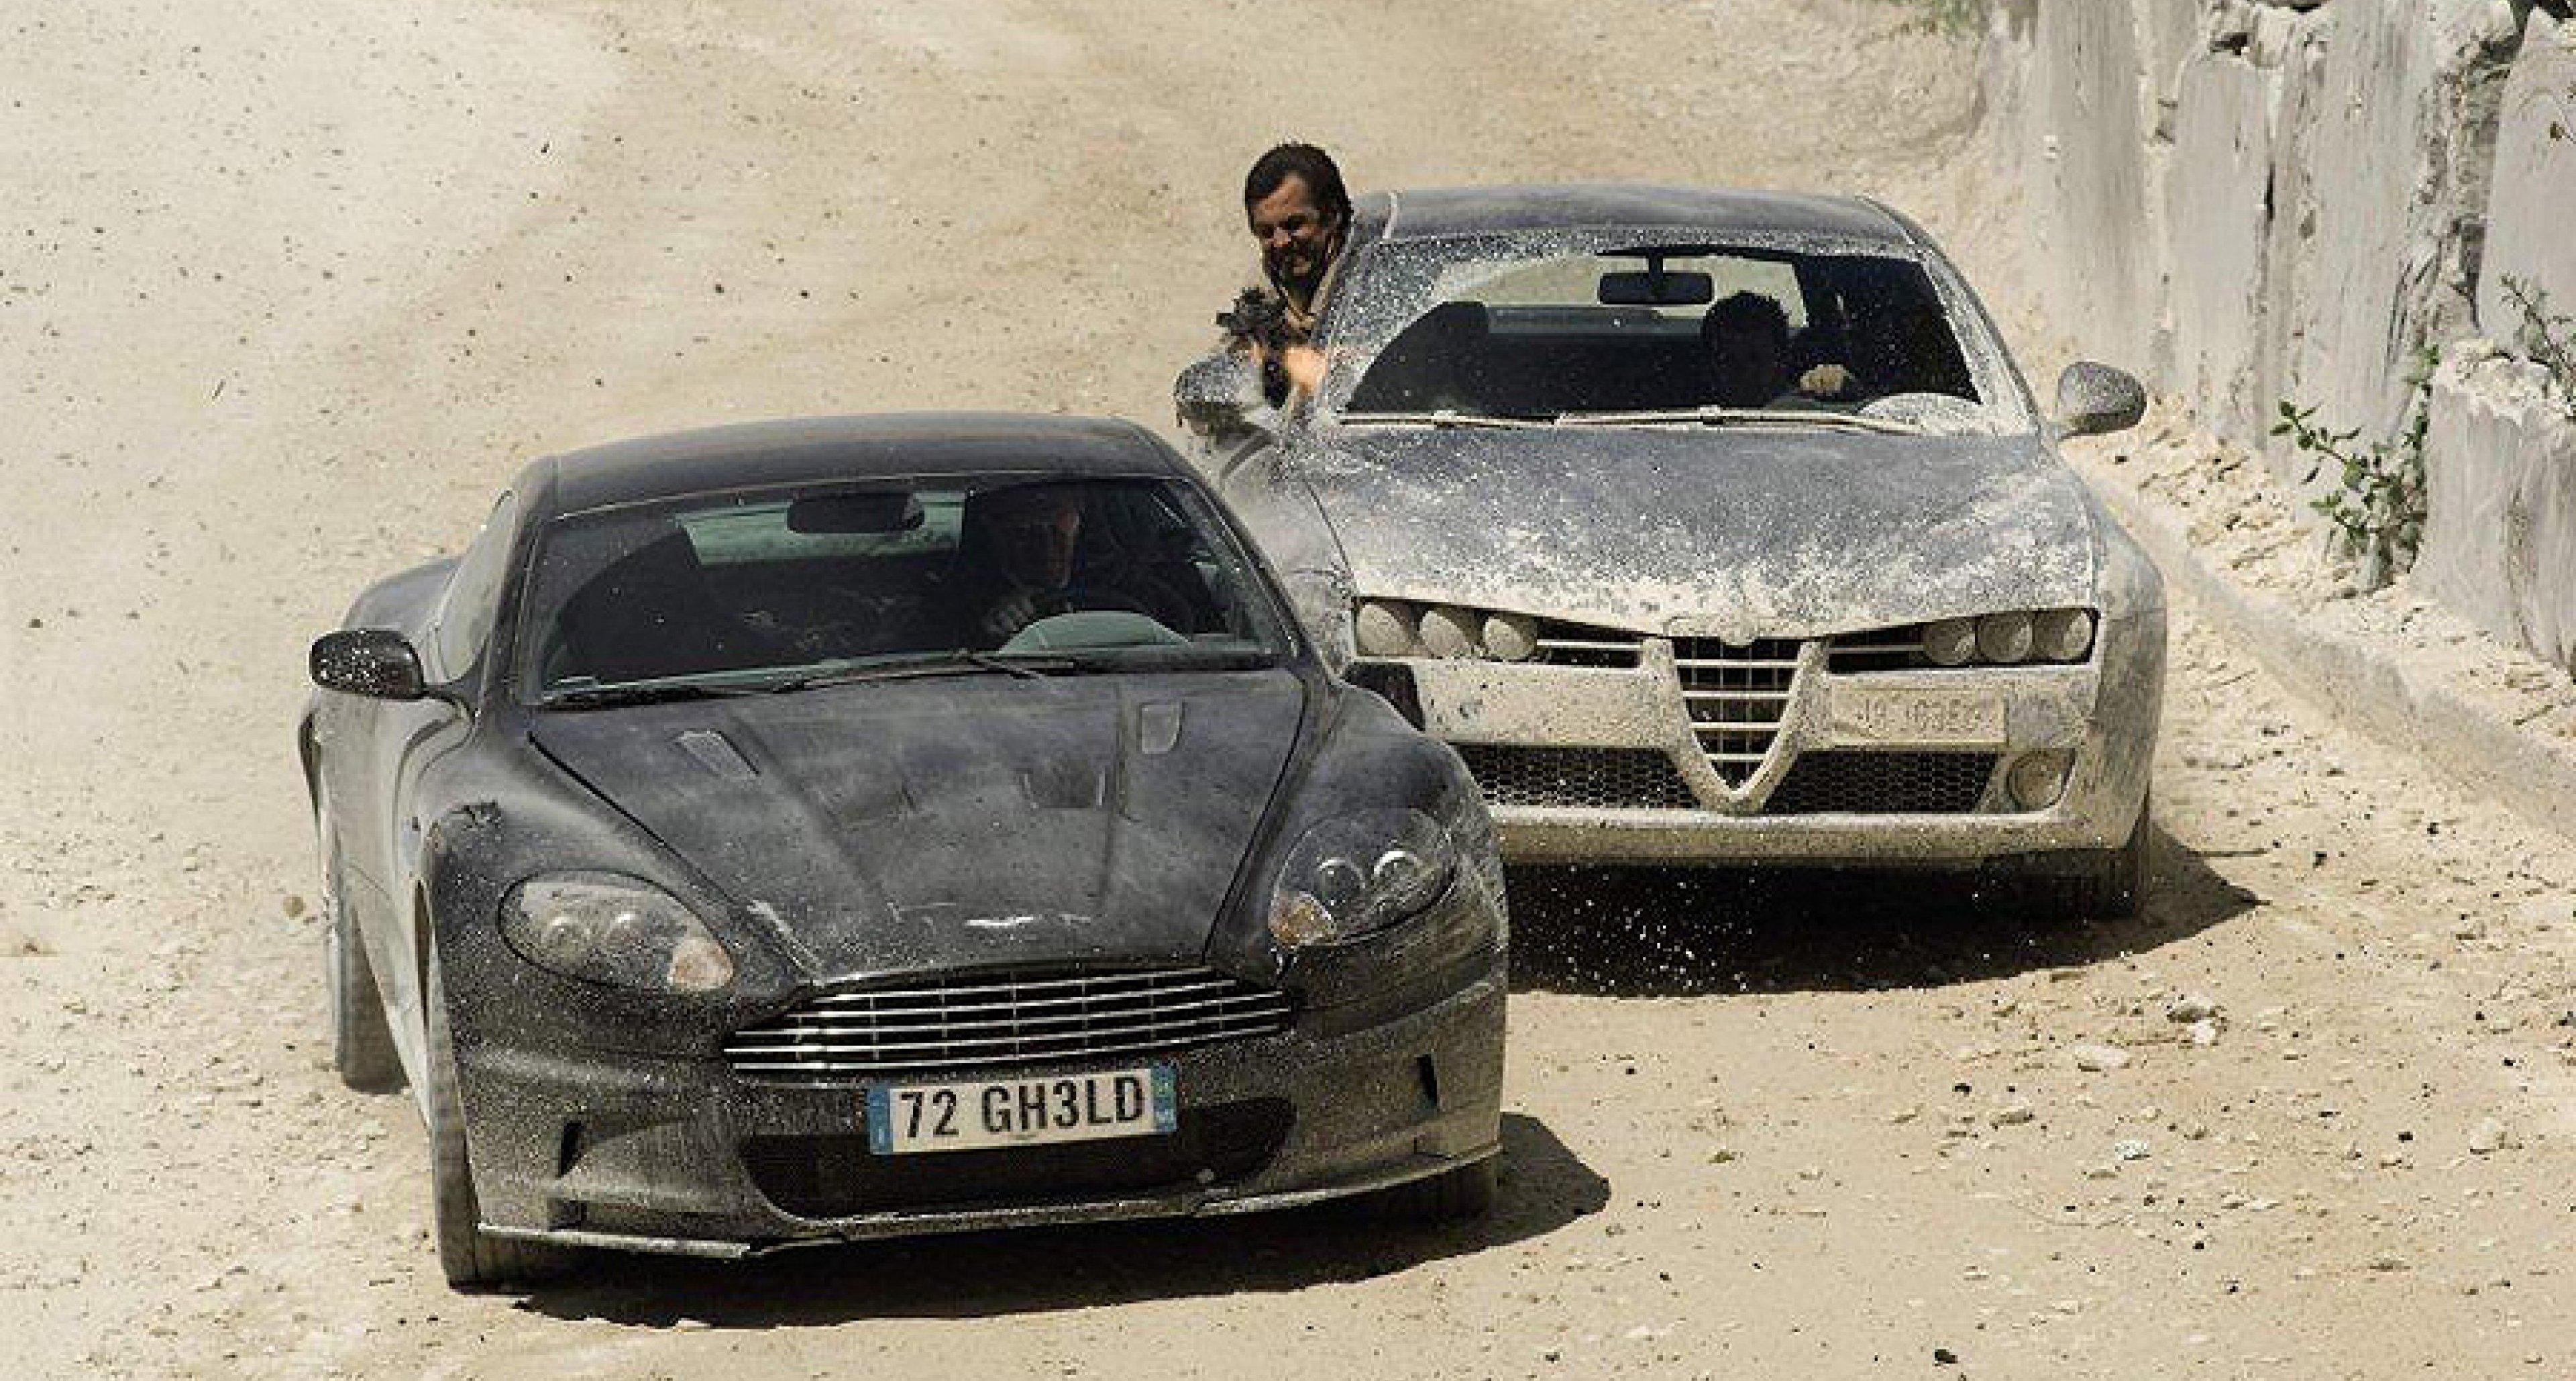 James Bond S Aston Martin Dbs Sells For 163 241 250 Classic